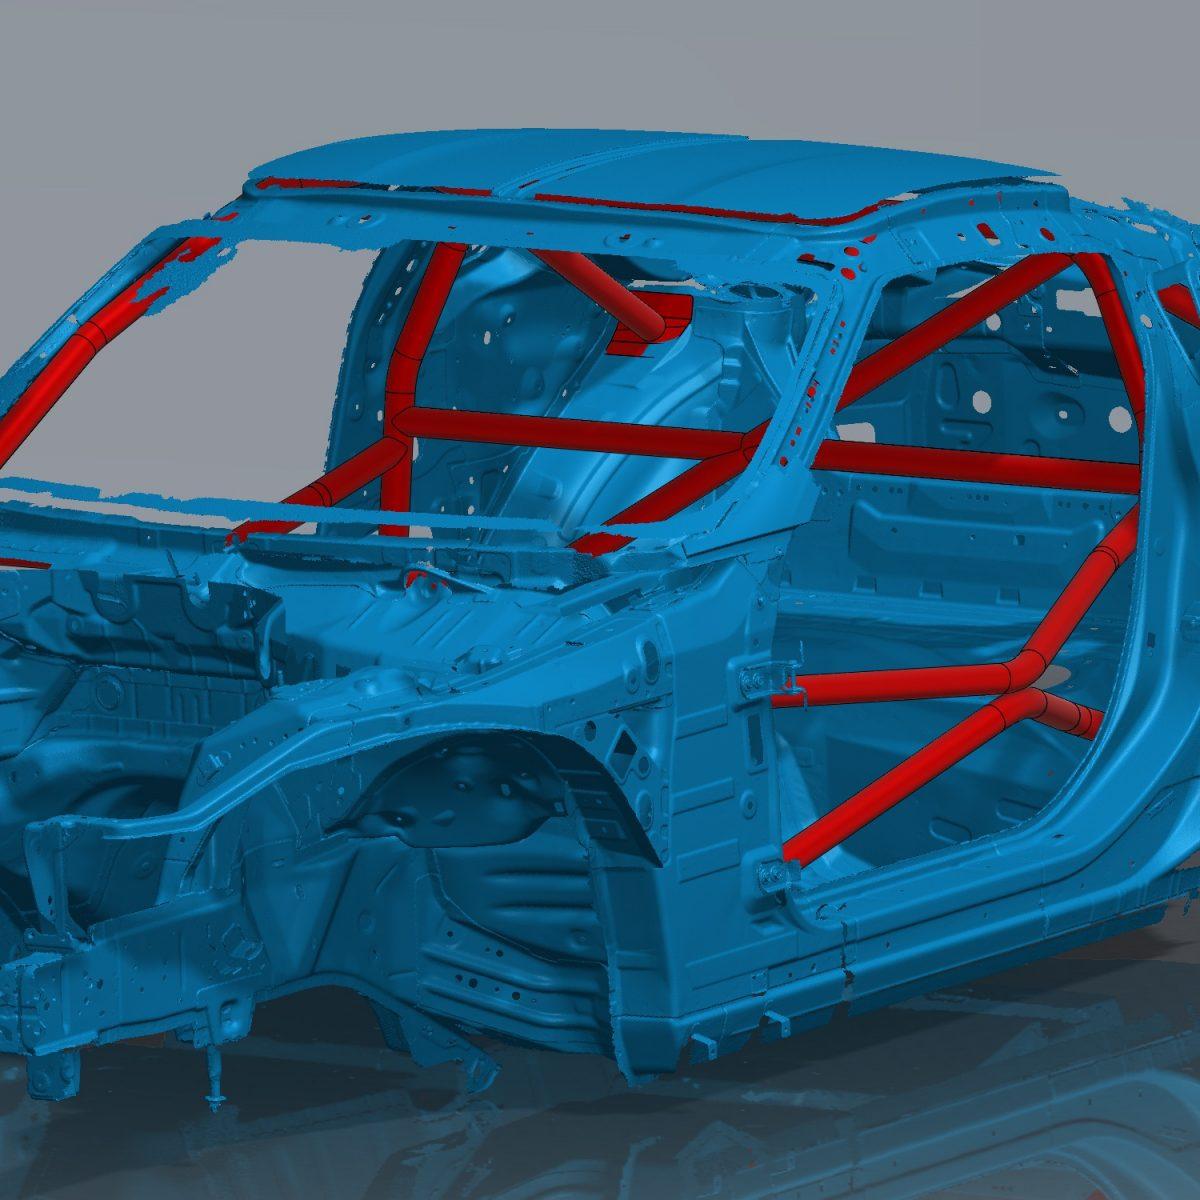 370Z Bare Minimum GTLC Roll cage